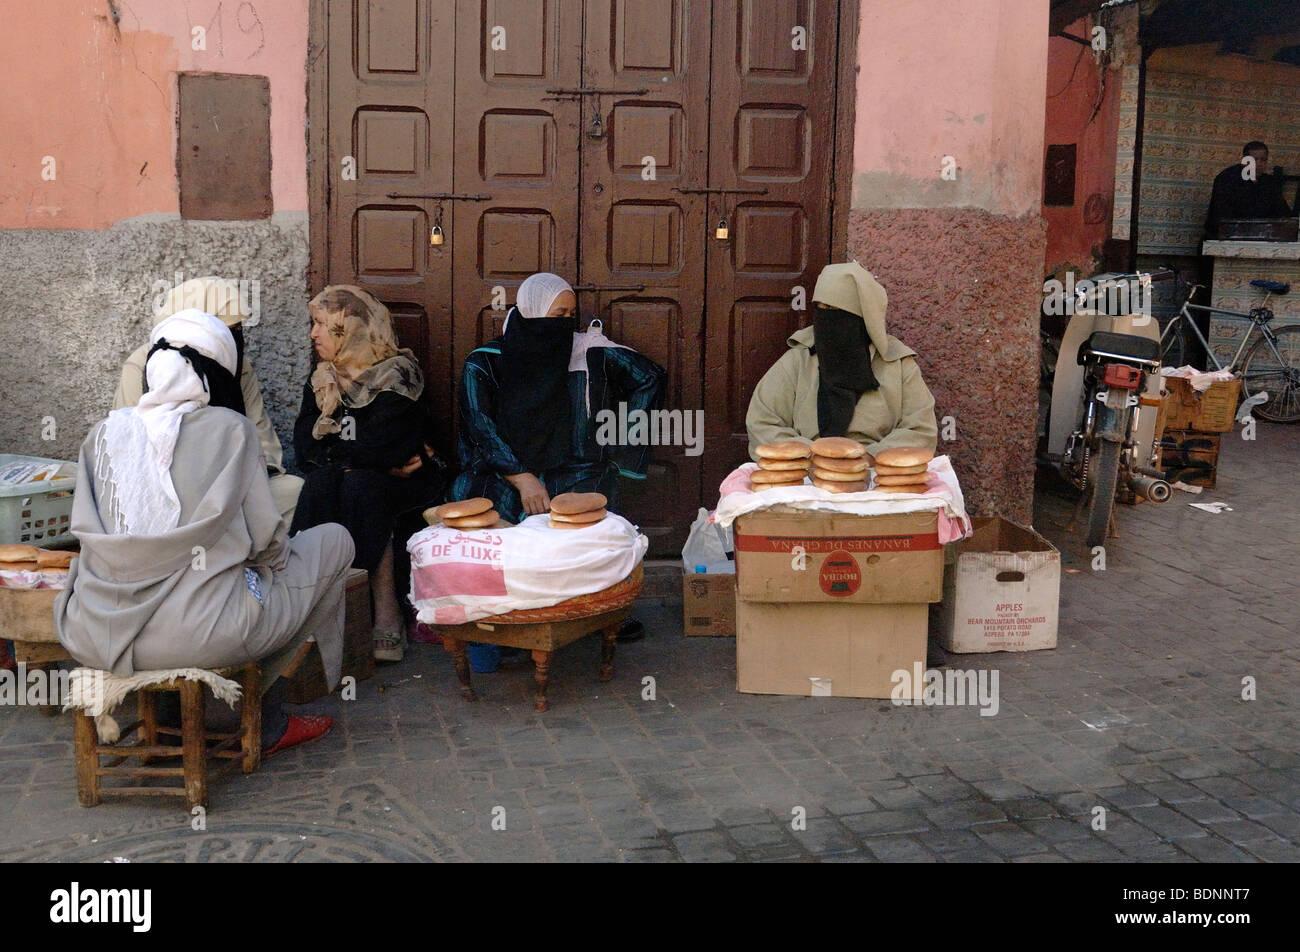 Poor Veiled Moroccan Arabic Muslim Women Selling Bread on the Street in Marrakesh, Morocco - Stock Image